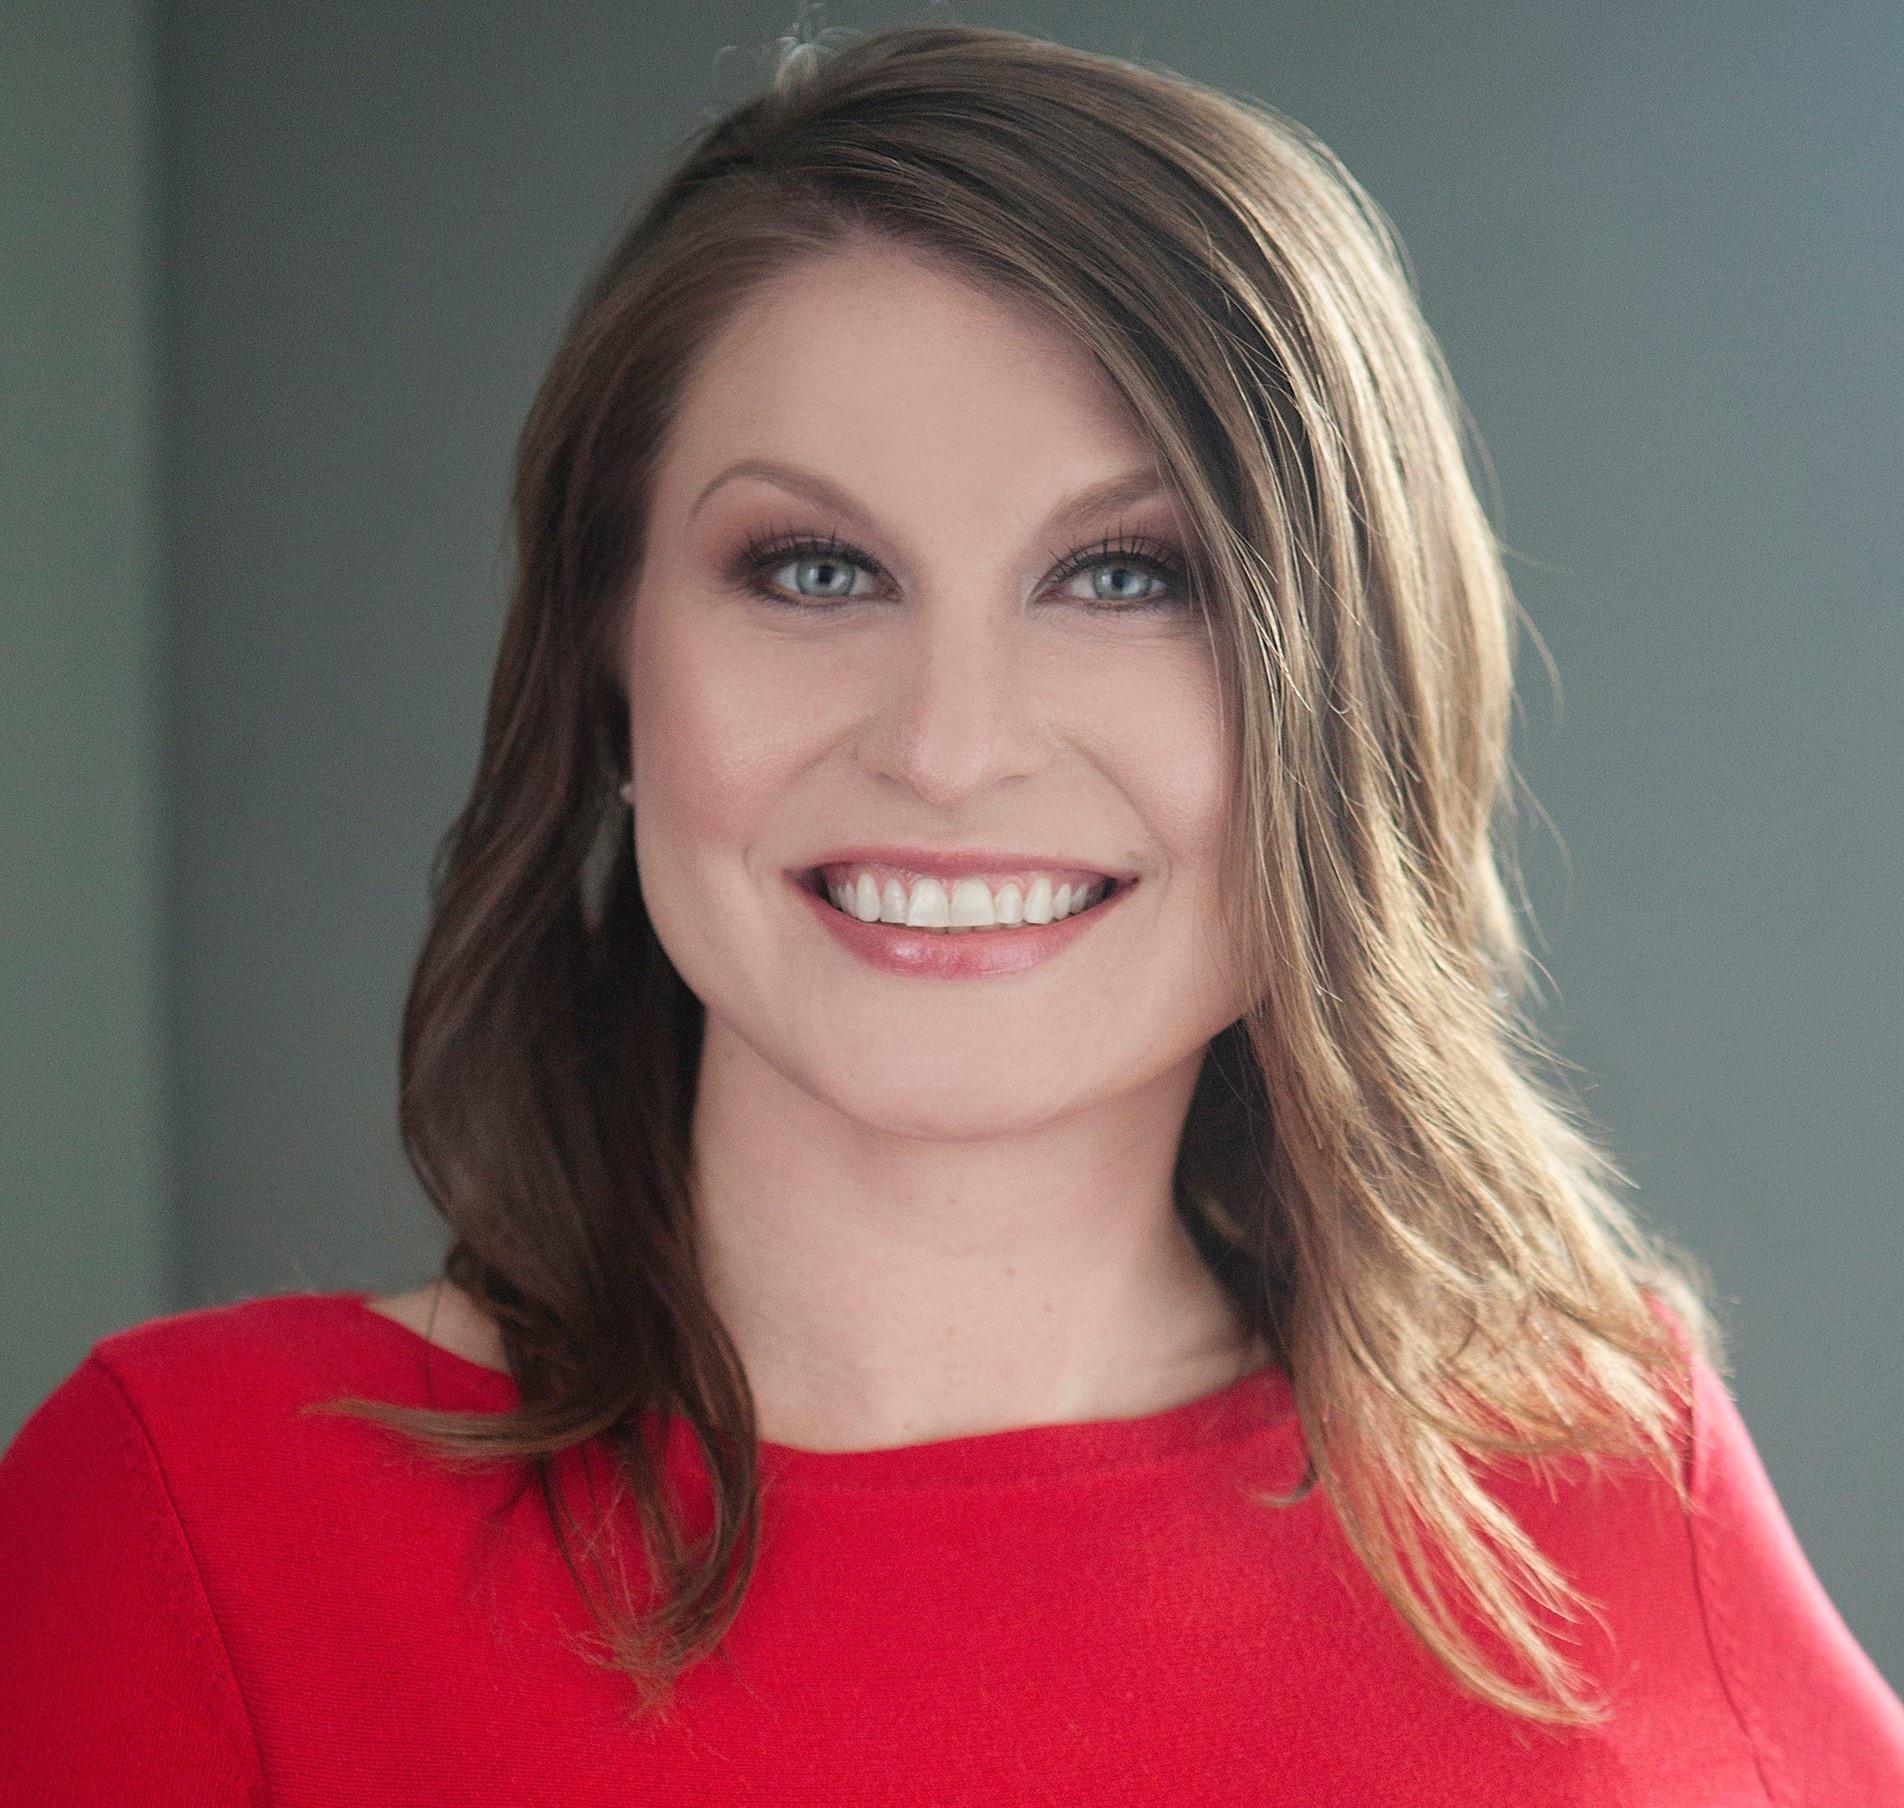 Leah Addison Gmfs Mortgage Sherwood Loan Oficer